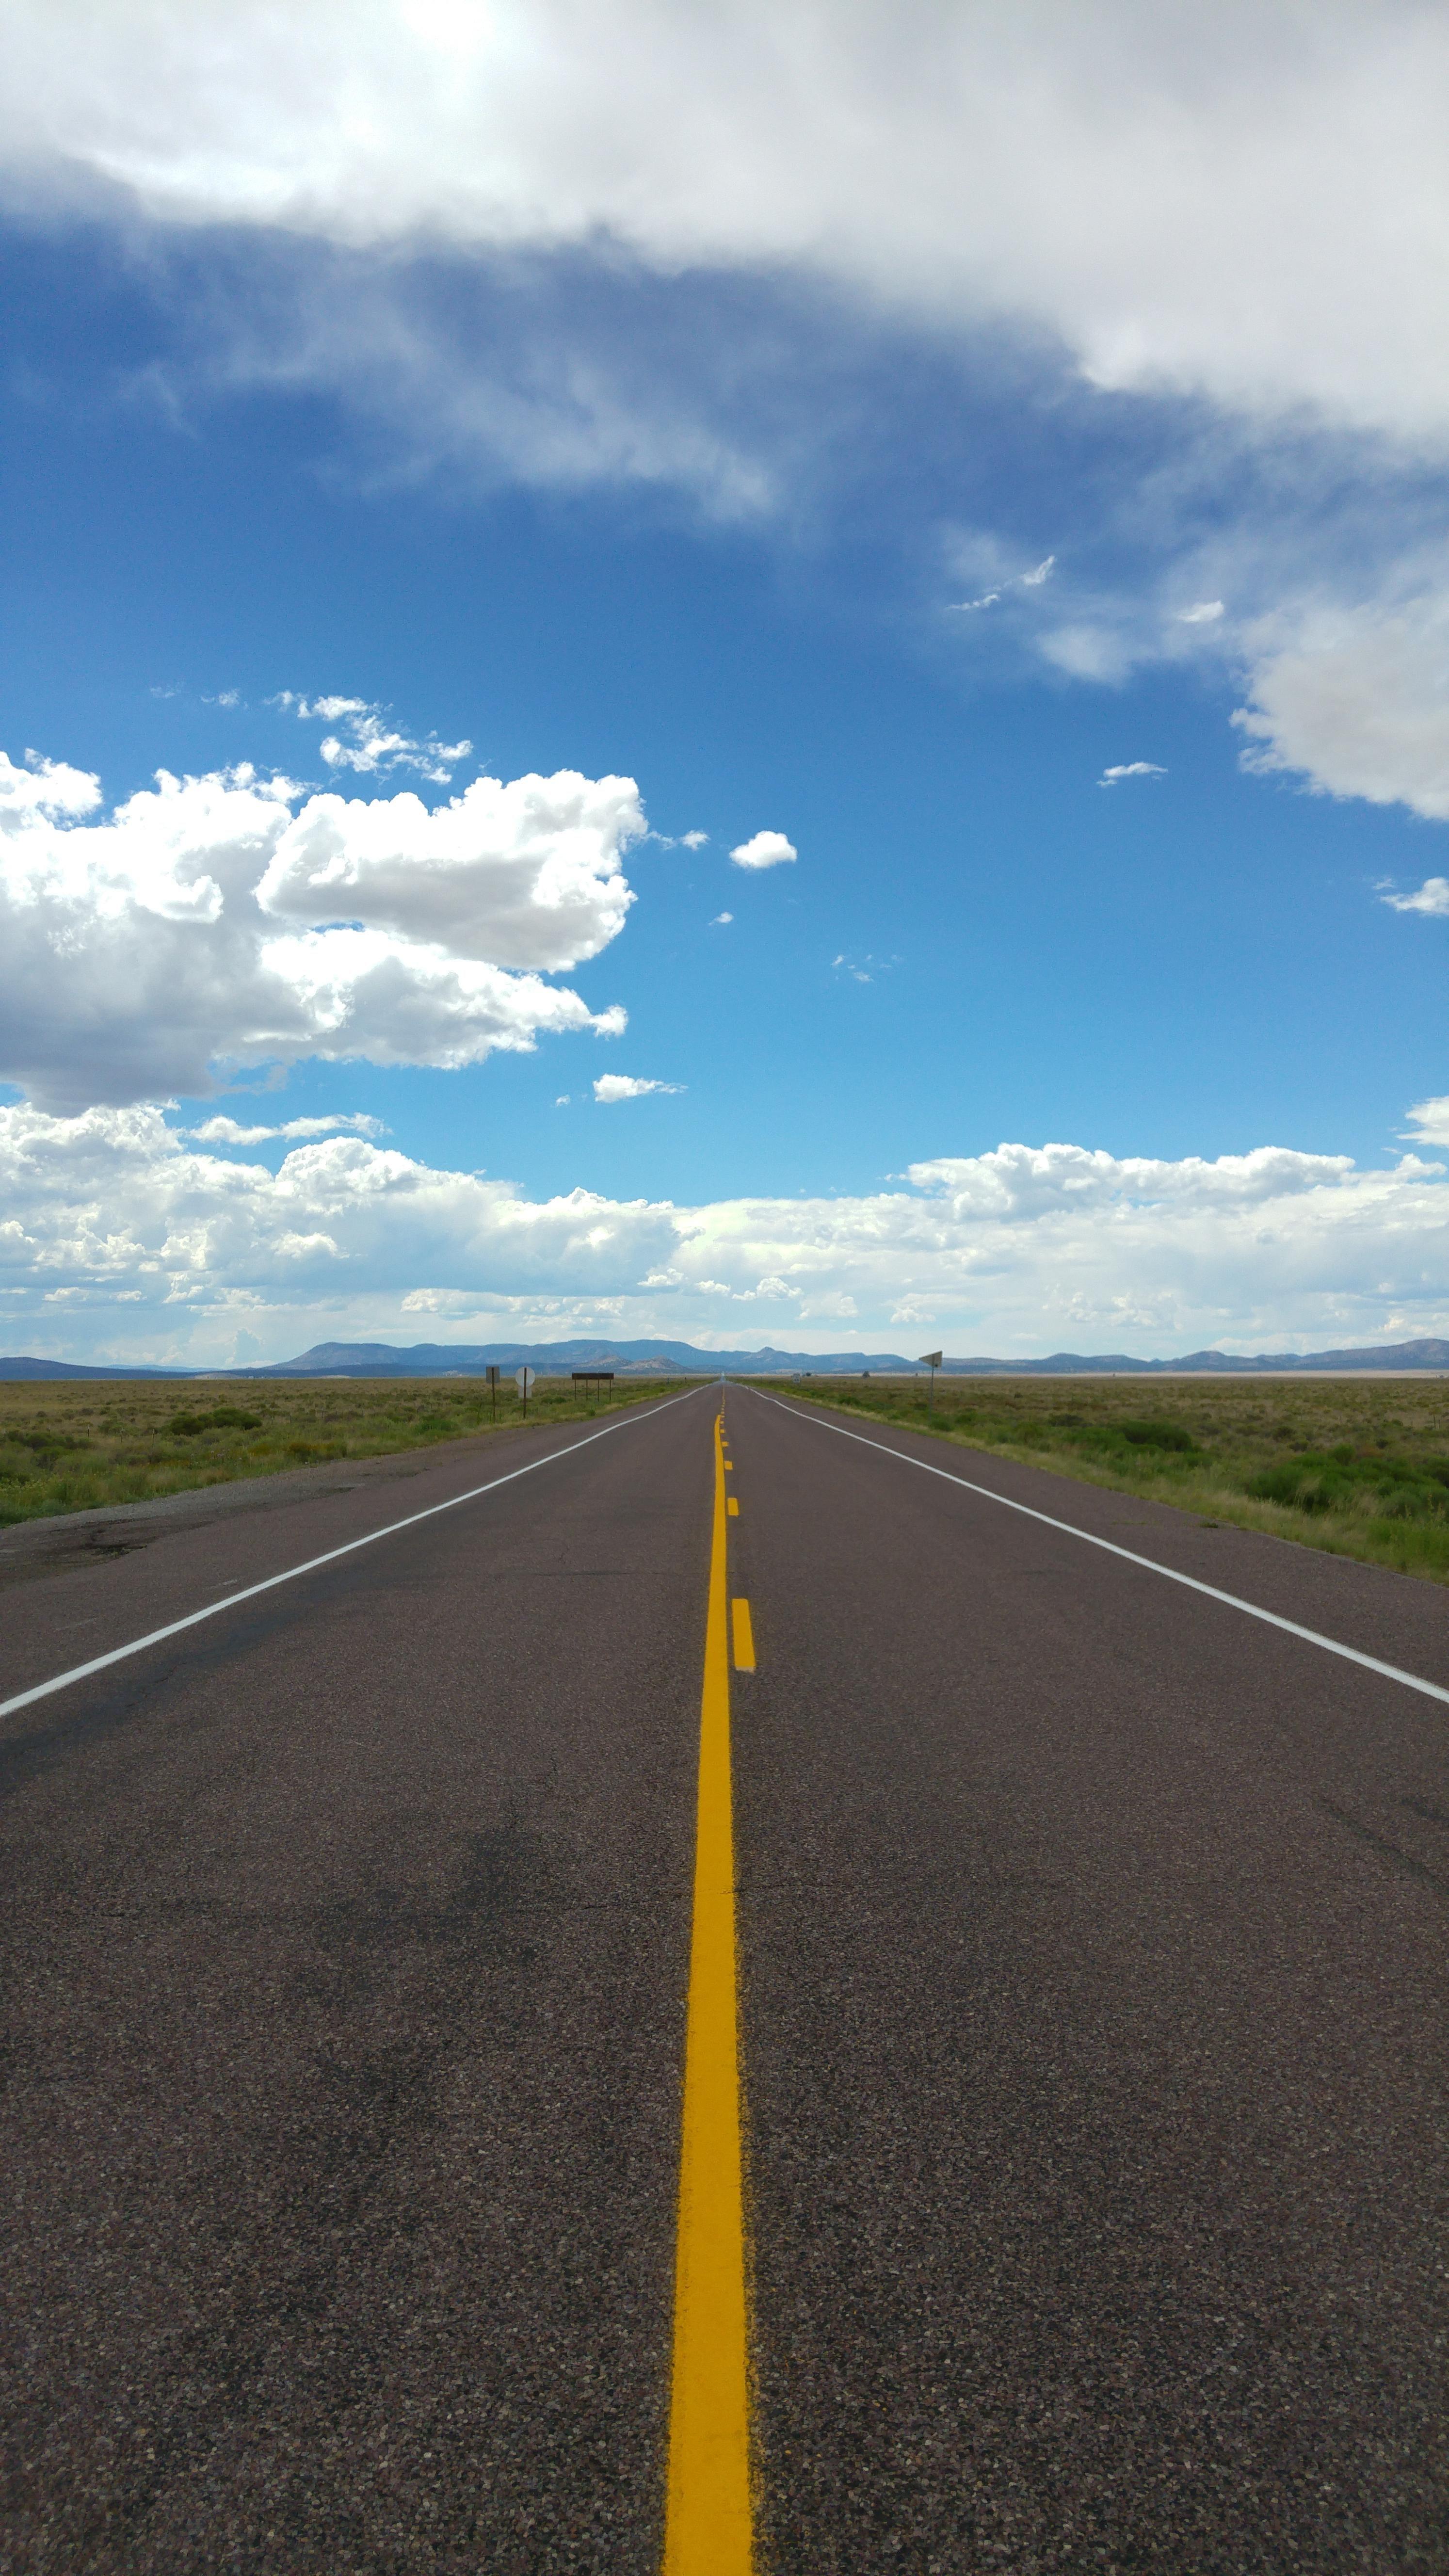 American Road (VLA New Mexico) imagens) Feiras